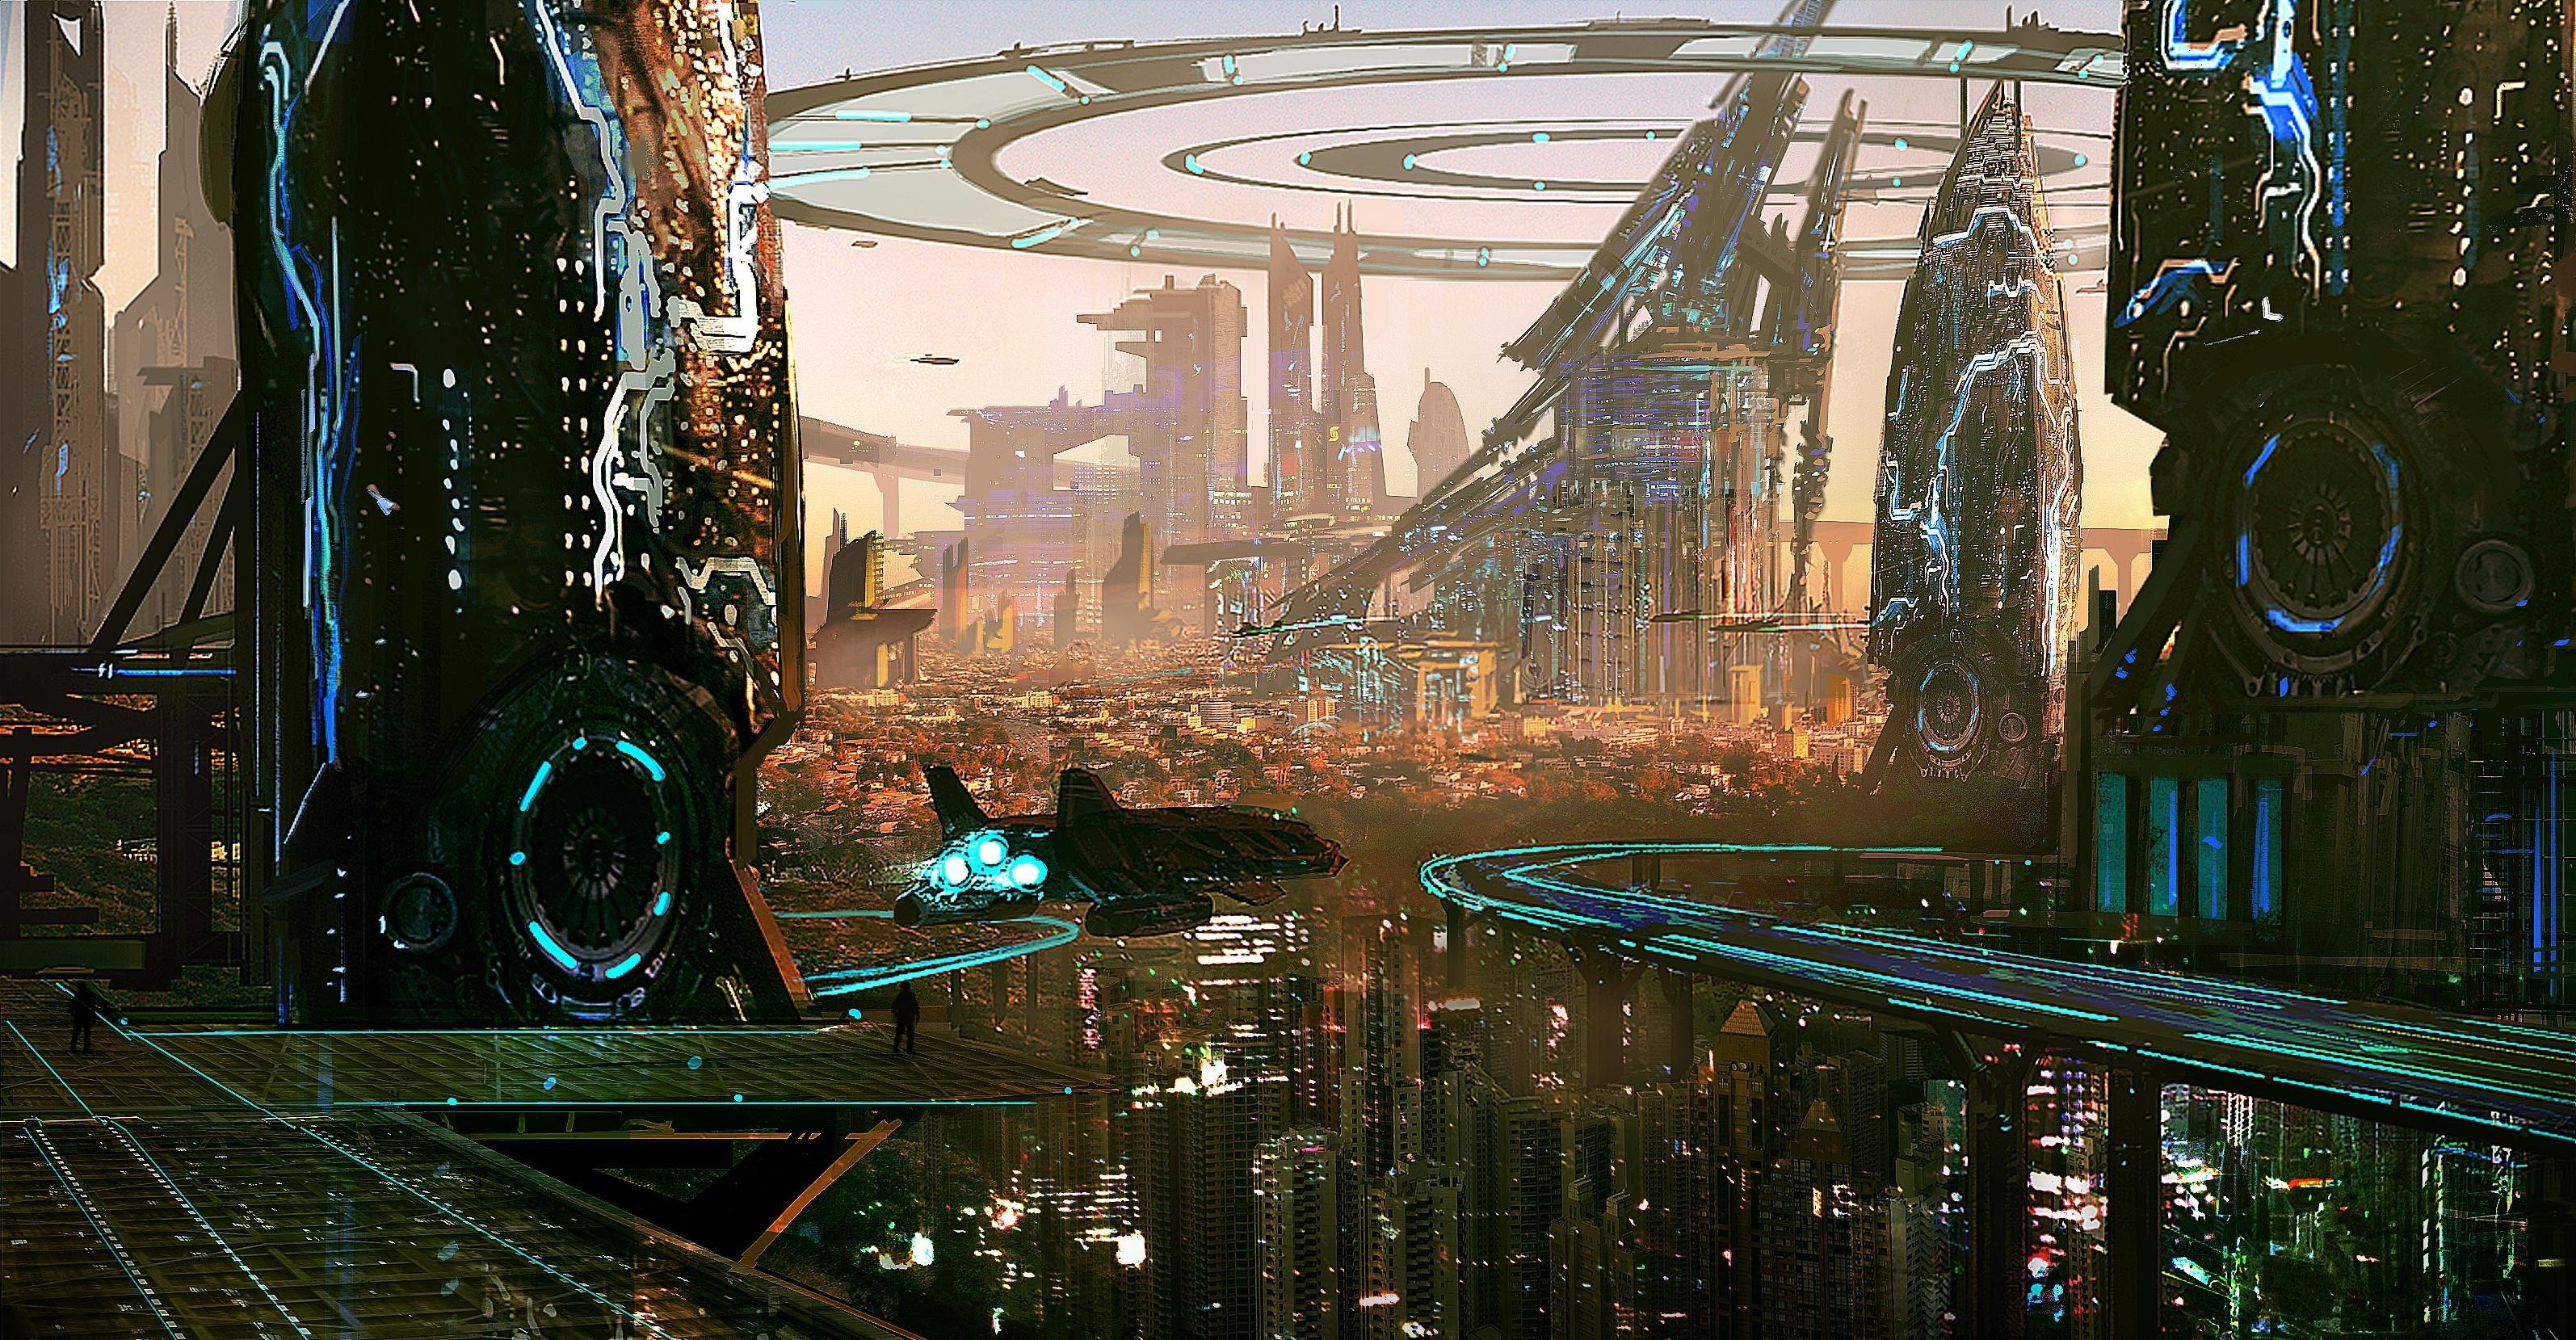 General 3189x1659 artwork city futuristic digital art building skyscraper futuristic city